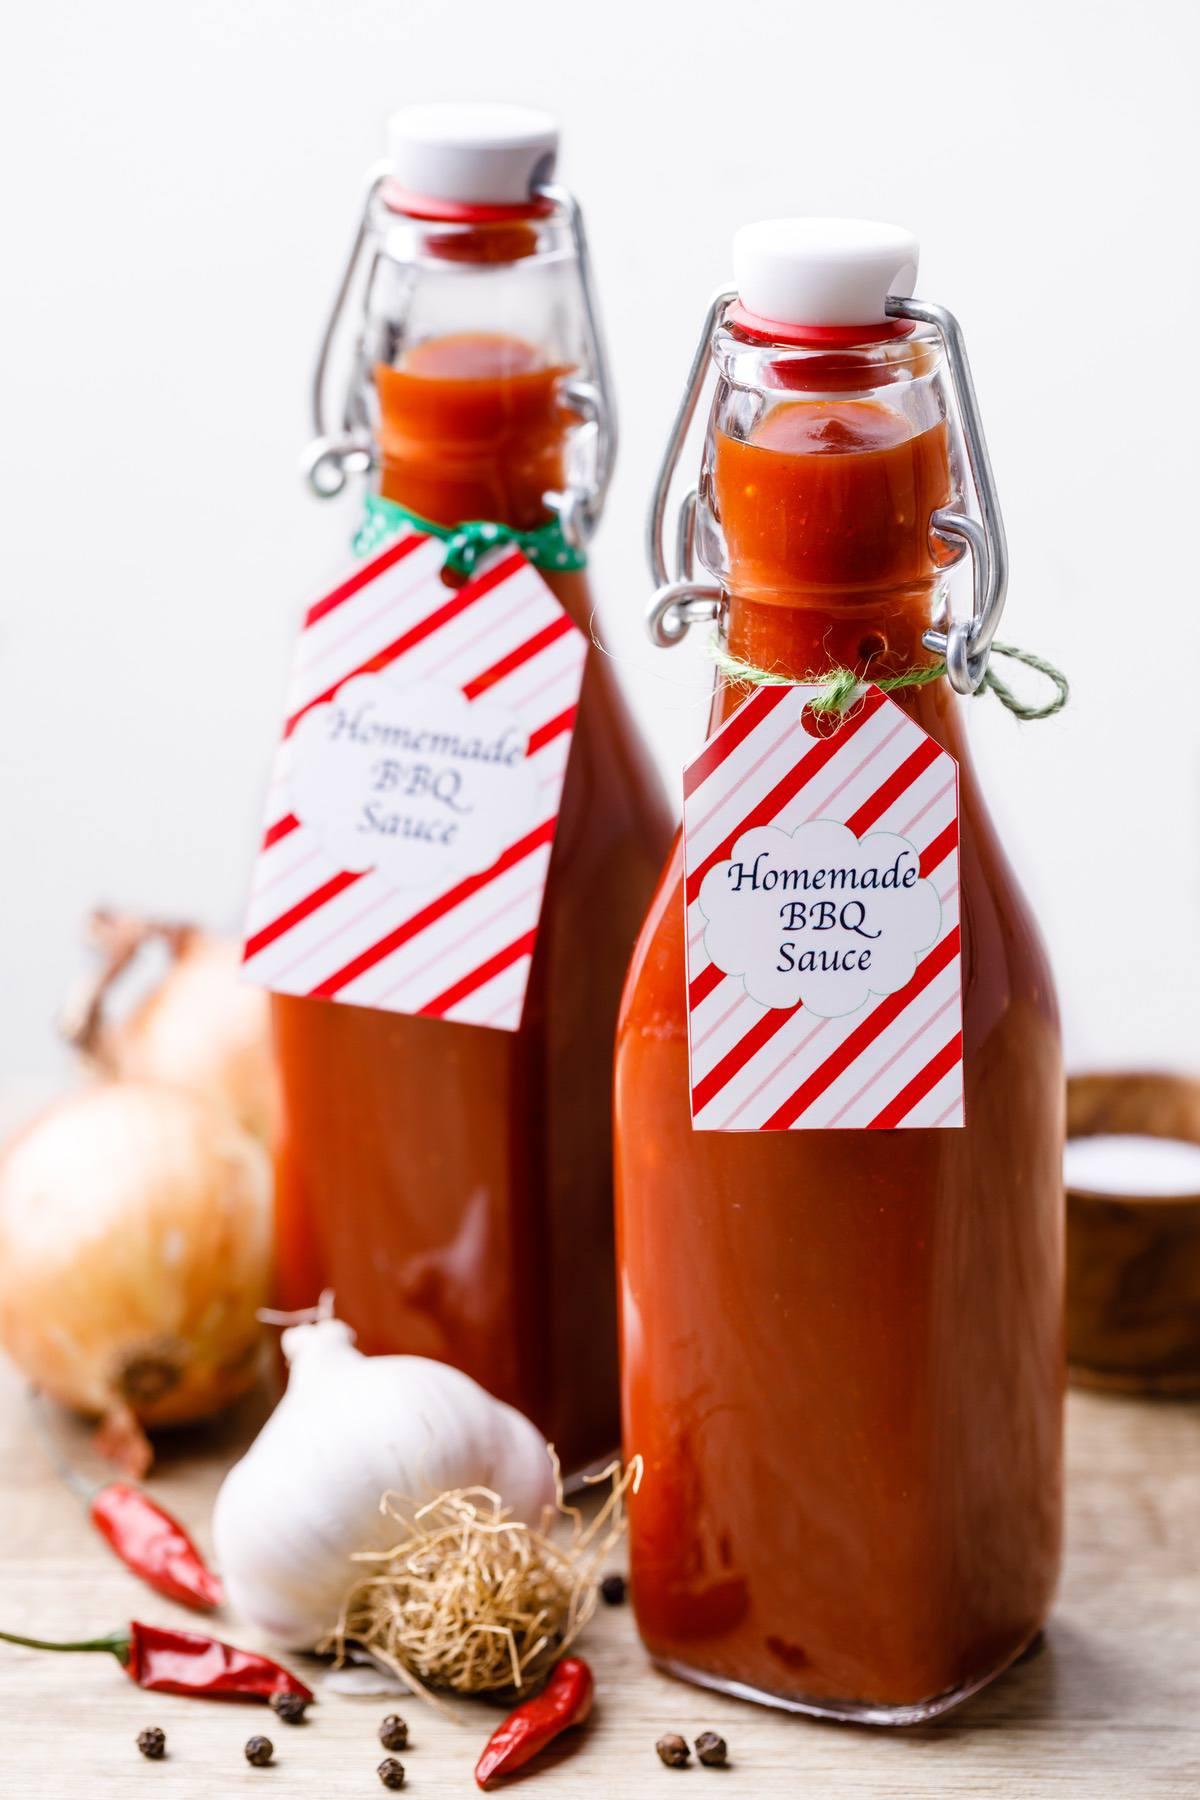 Homemade Bbq Sauce Gift